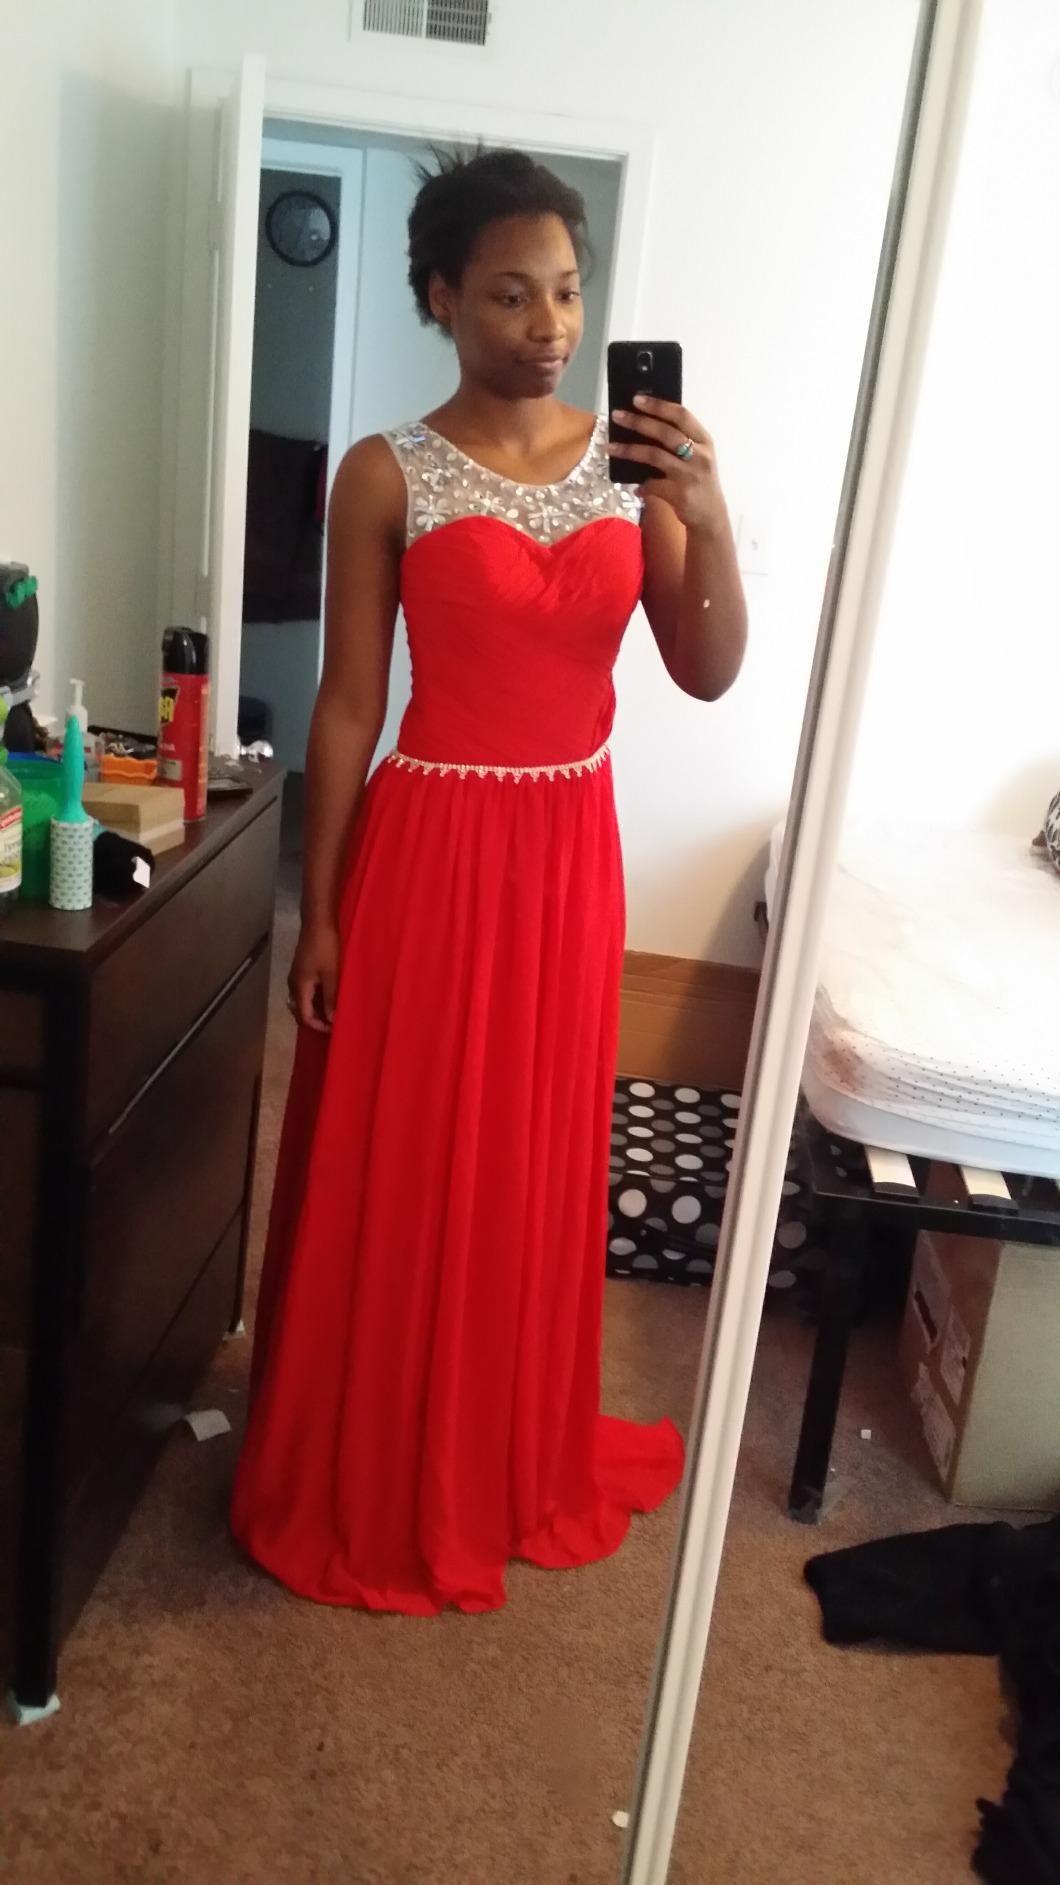 Pin by julio bradford on clothing pinterest red chiffon prom